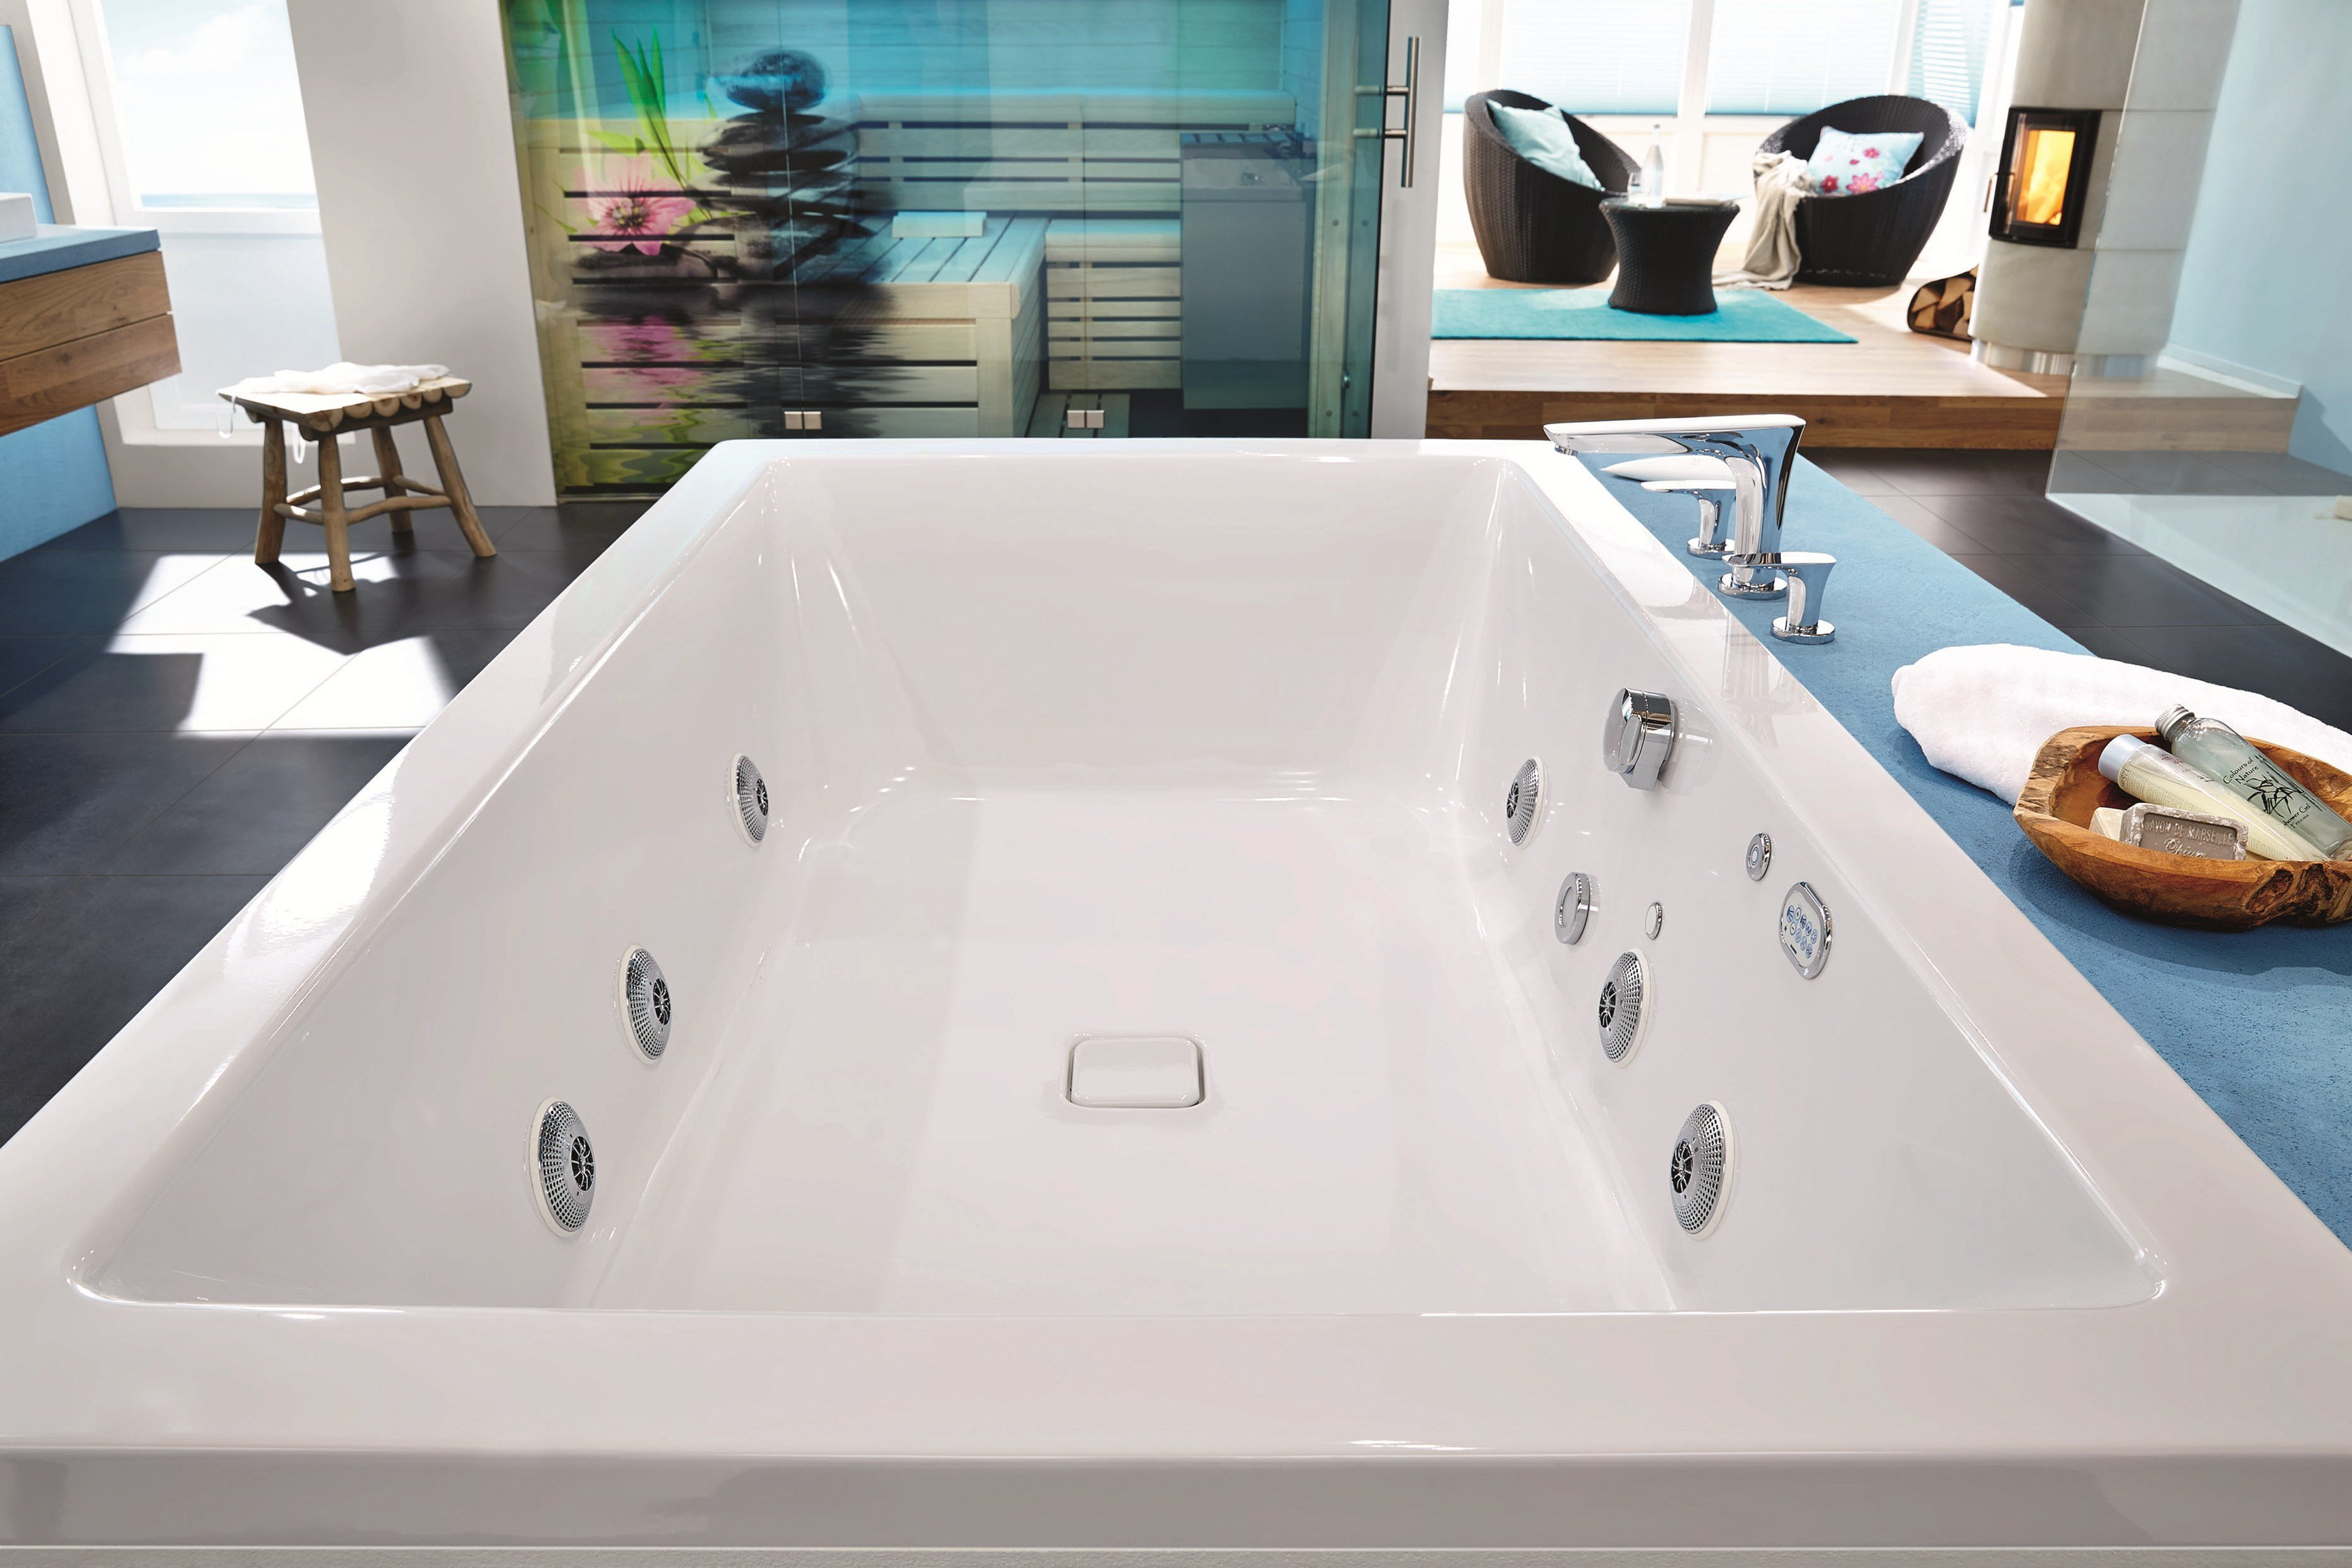 whirlpool einbau badewanne f r chromotherapie conopool by. Black Bedroom Furniture Sets. Home Design Ideas